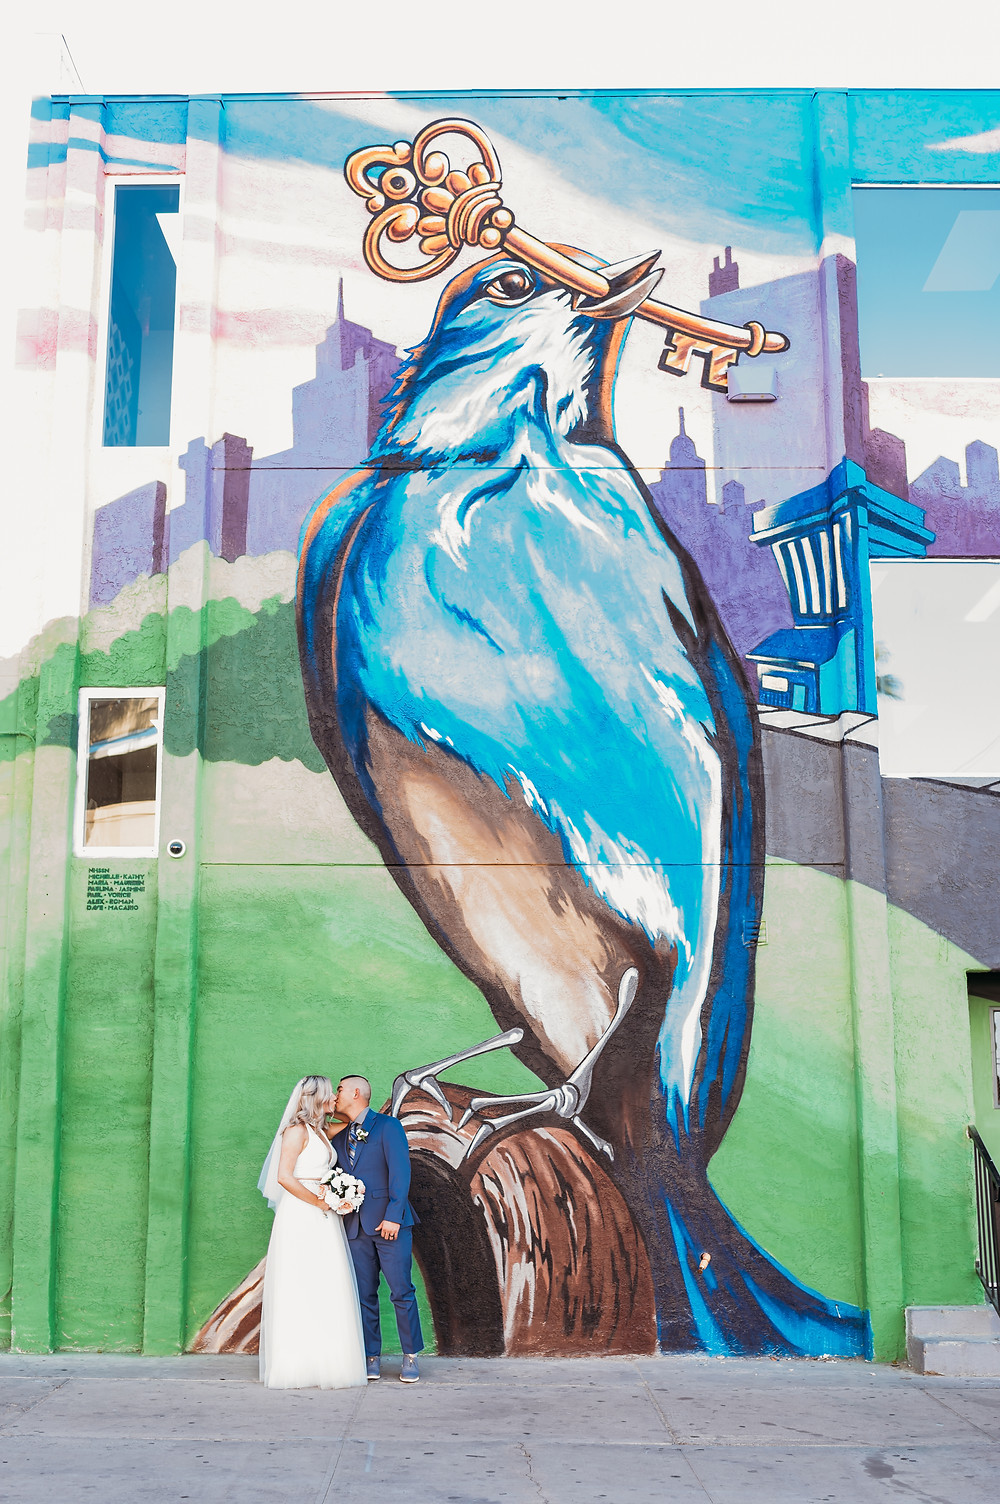 las vegas wedding, las vegas, art mural, downtown las vegas, vegas bride and groom, vegas wedding, vegas bride, downtown portraits, wedding portrait, couples portraits, vegas elopement, las vegas intimate wedding, intimate wedding, destionation wedding, elopement